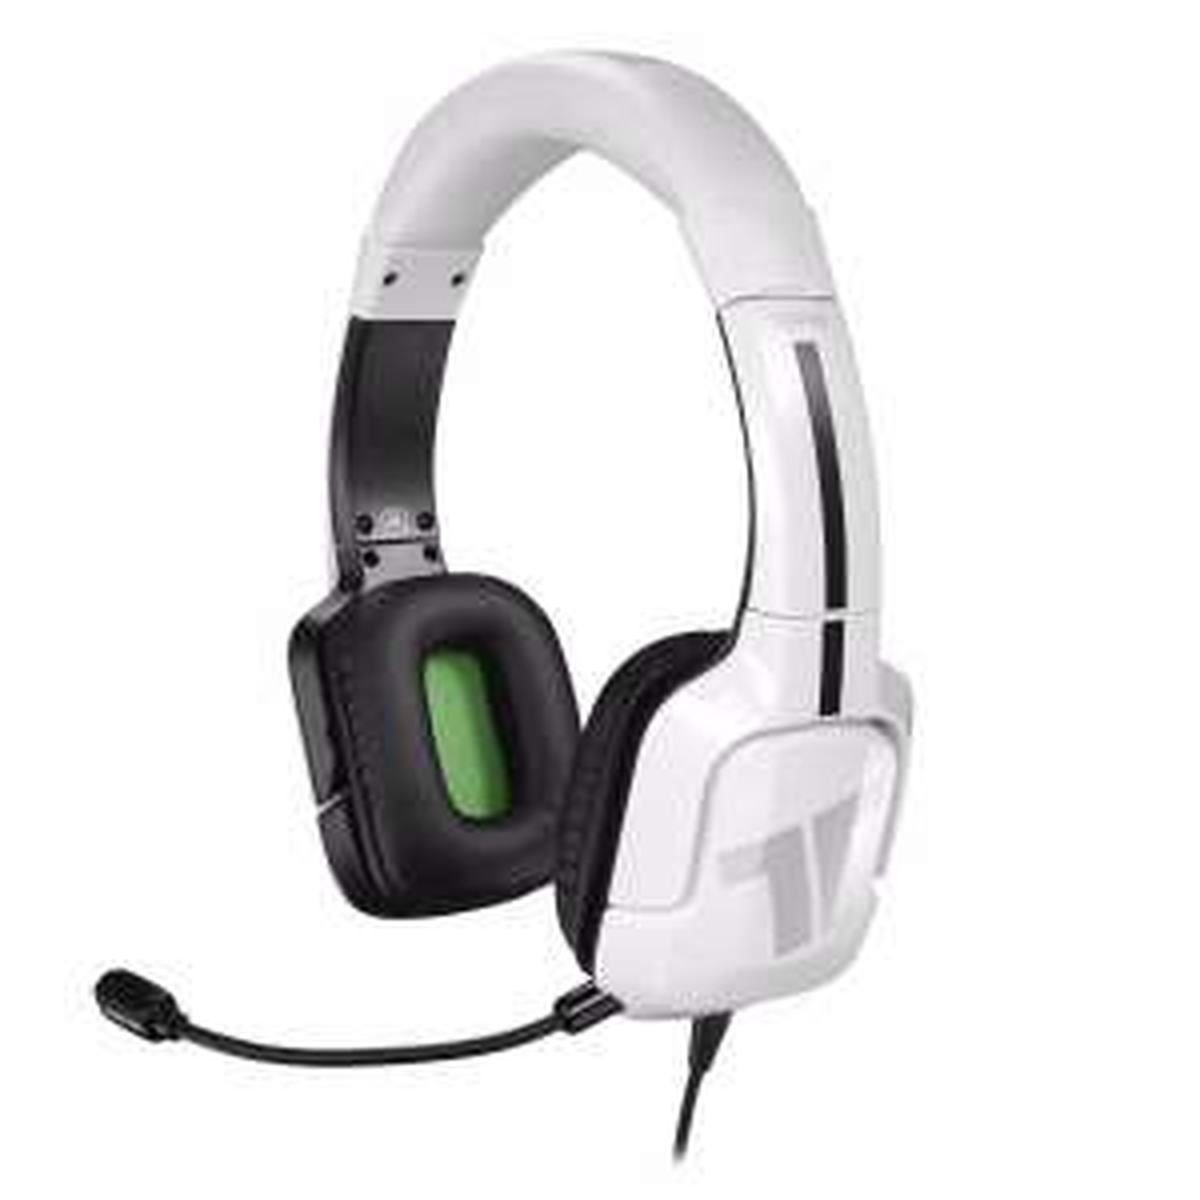 Kama Tritton Headset 3.5mm (white) £14.99 @ Go2Games